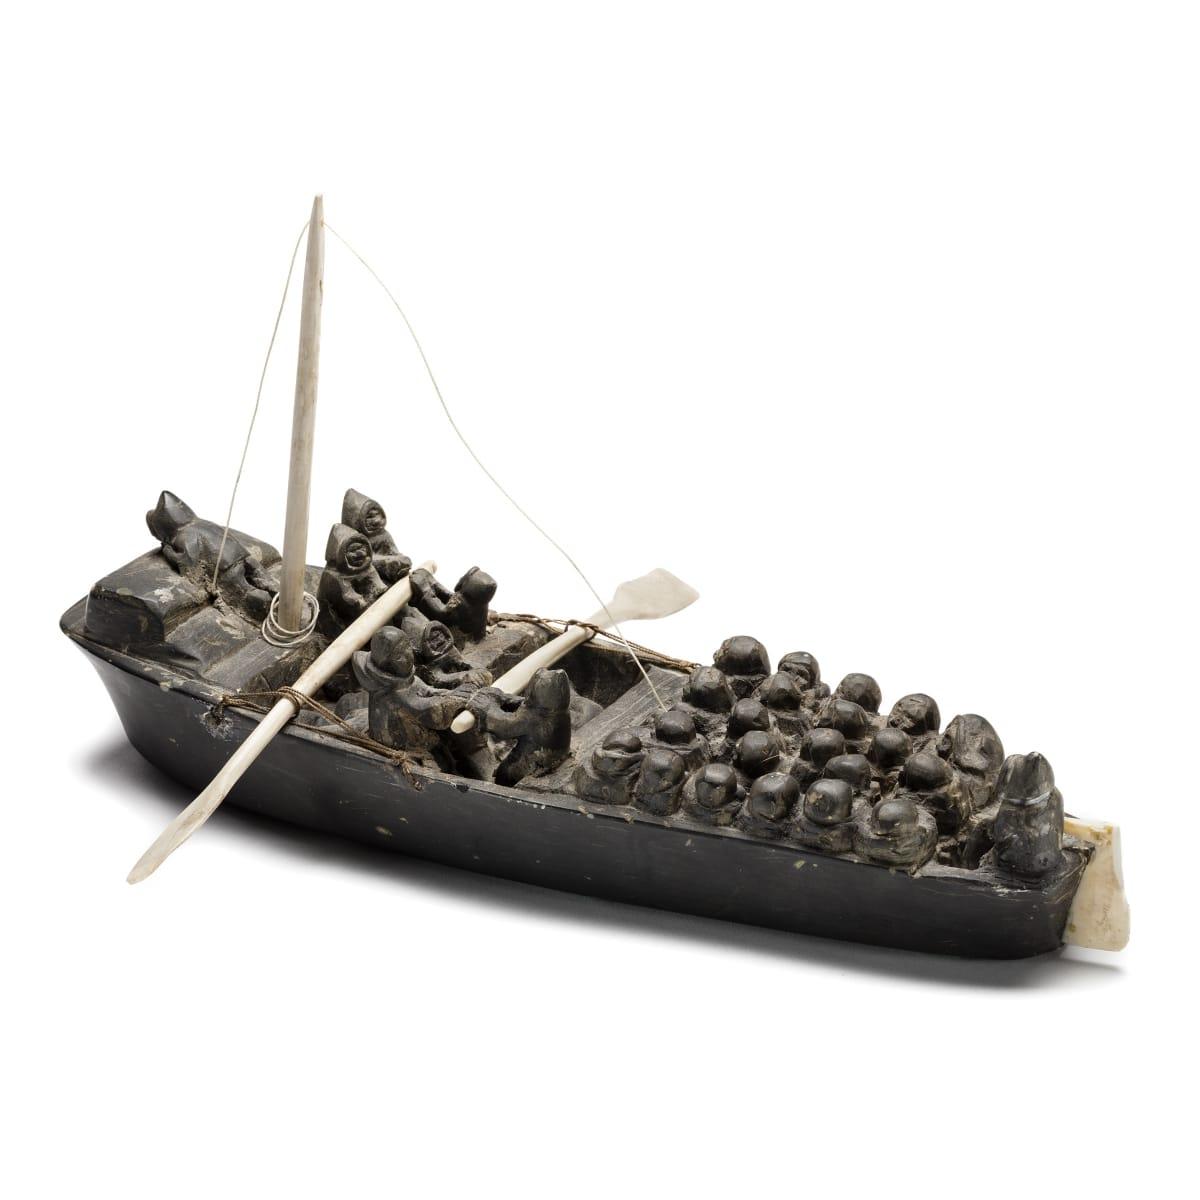 ENNUTSIAK (1896-1967) IQALUIT (FROBISHER BAY) Umiaq Migration, late 1950s ESTIMATE: $25,000 — $35,000 PRICE REALIZED: $66,000